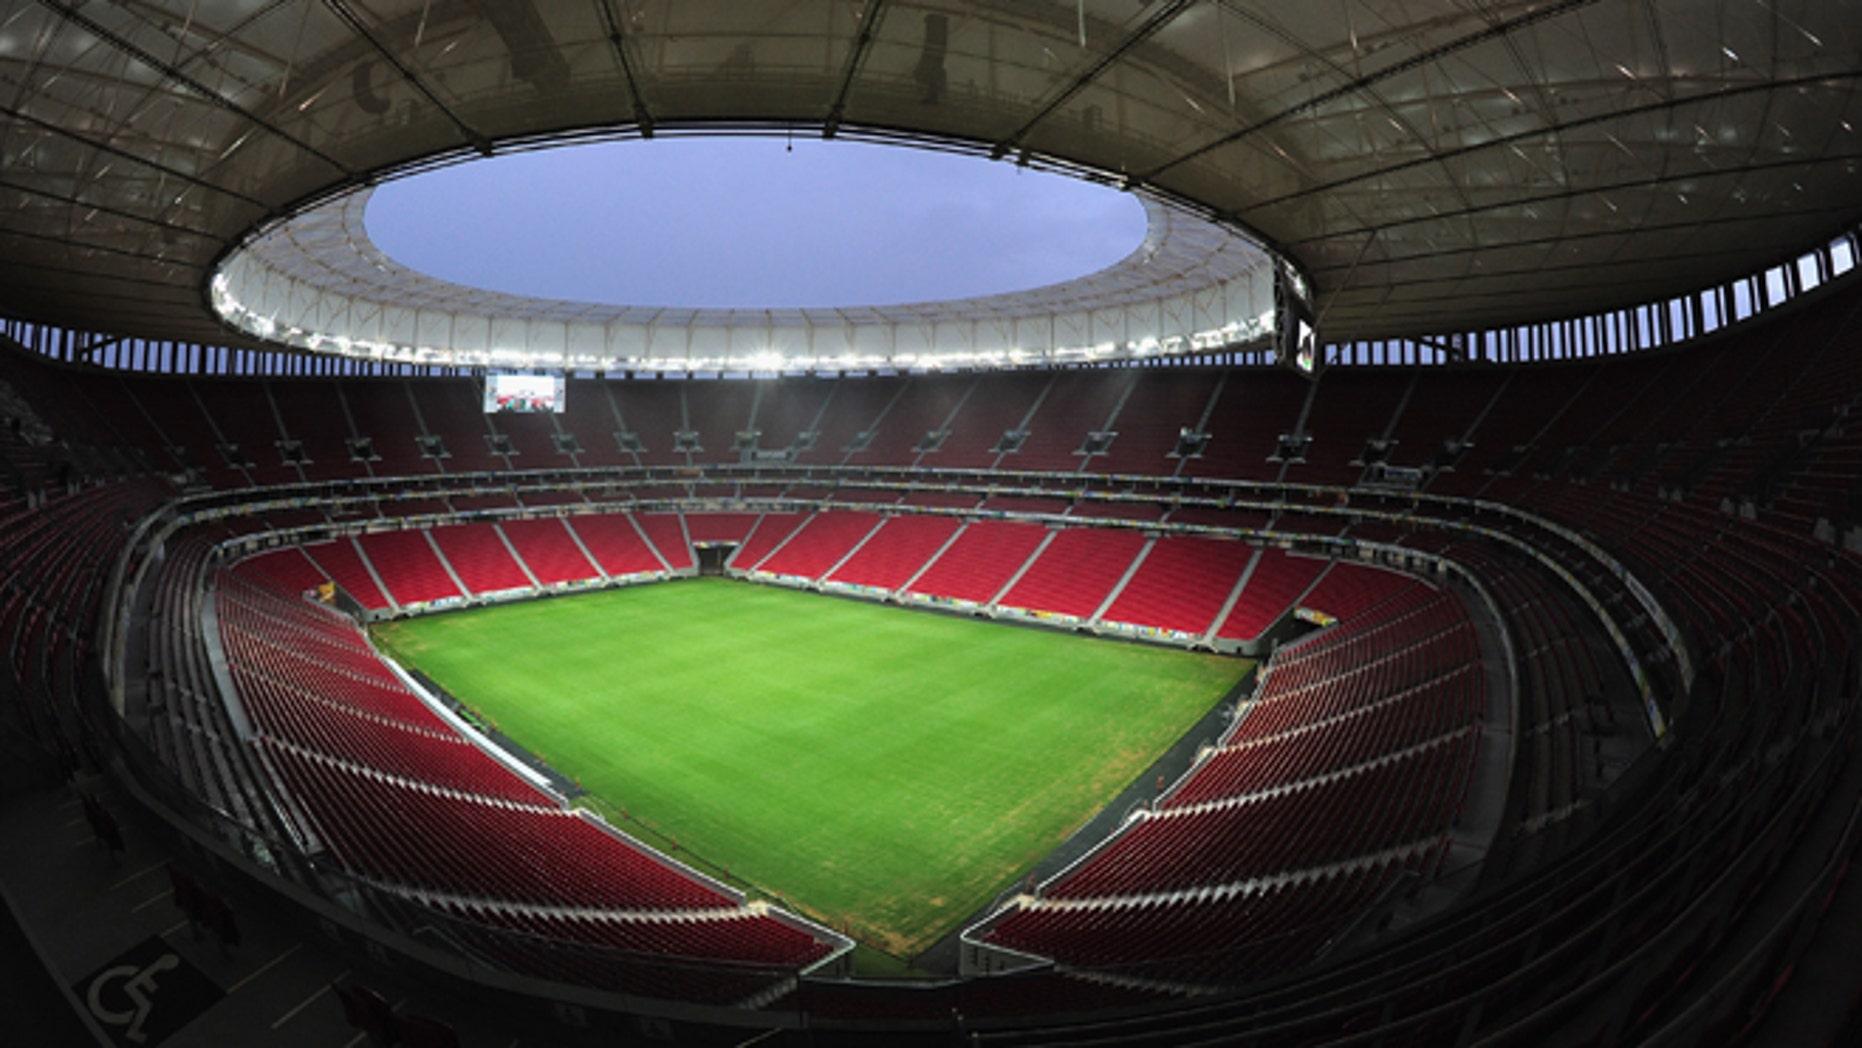 BRASILIA, BRAZIL - DECEMBER 09:  A general view of the Mane Garrincha Stadium venue for the 2014 FIFA World Cup Brazil on December 9, 2013 in Brasilia, Brazil.  (Photo by Shaun Botterill/Getty Images,)